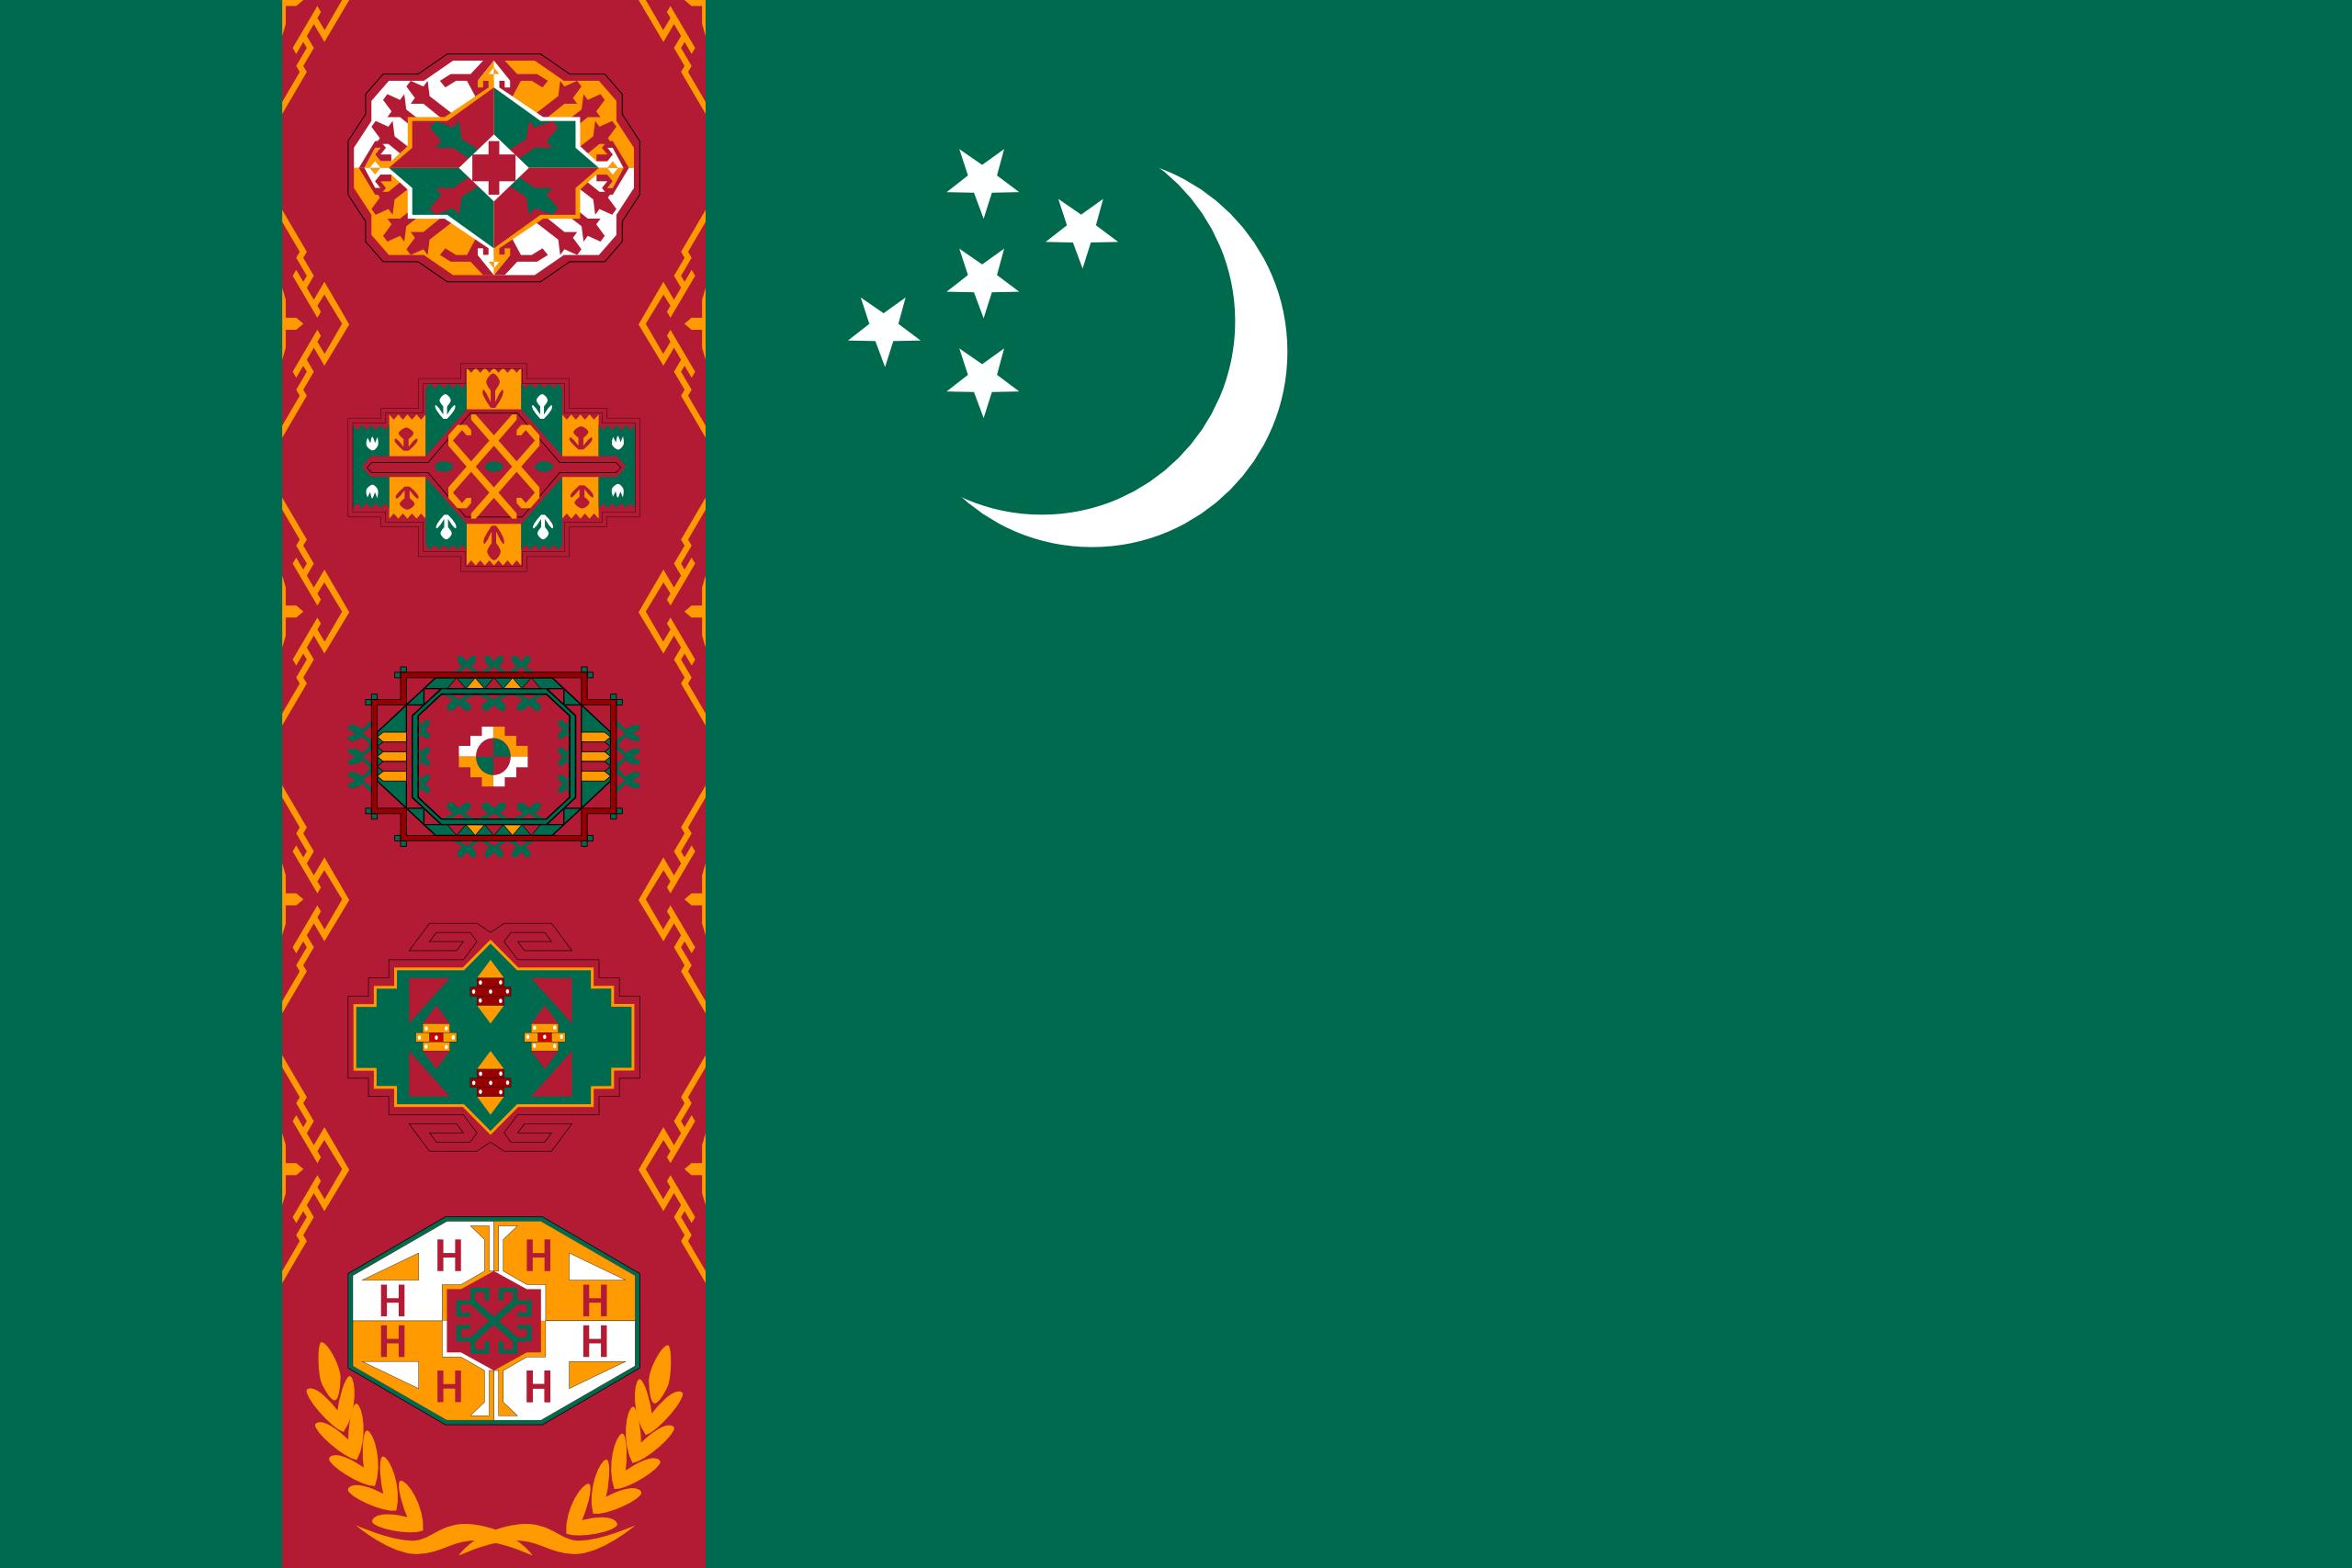 turkmenistán, paese, emblema, logo, simbolo - Sfondi HD - Professor-falken.com